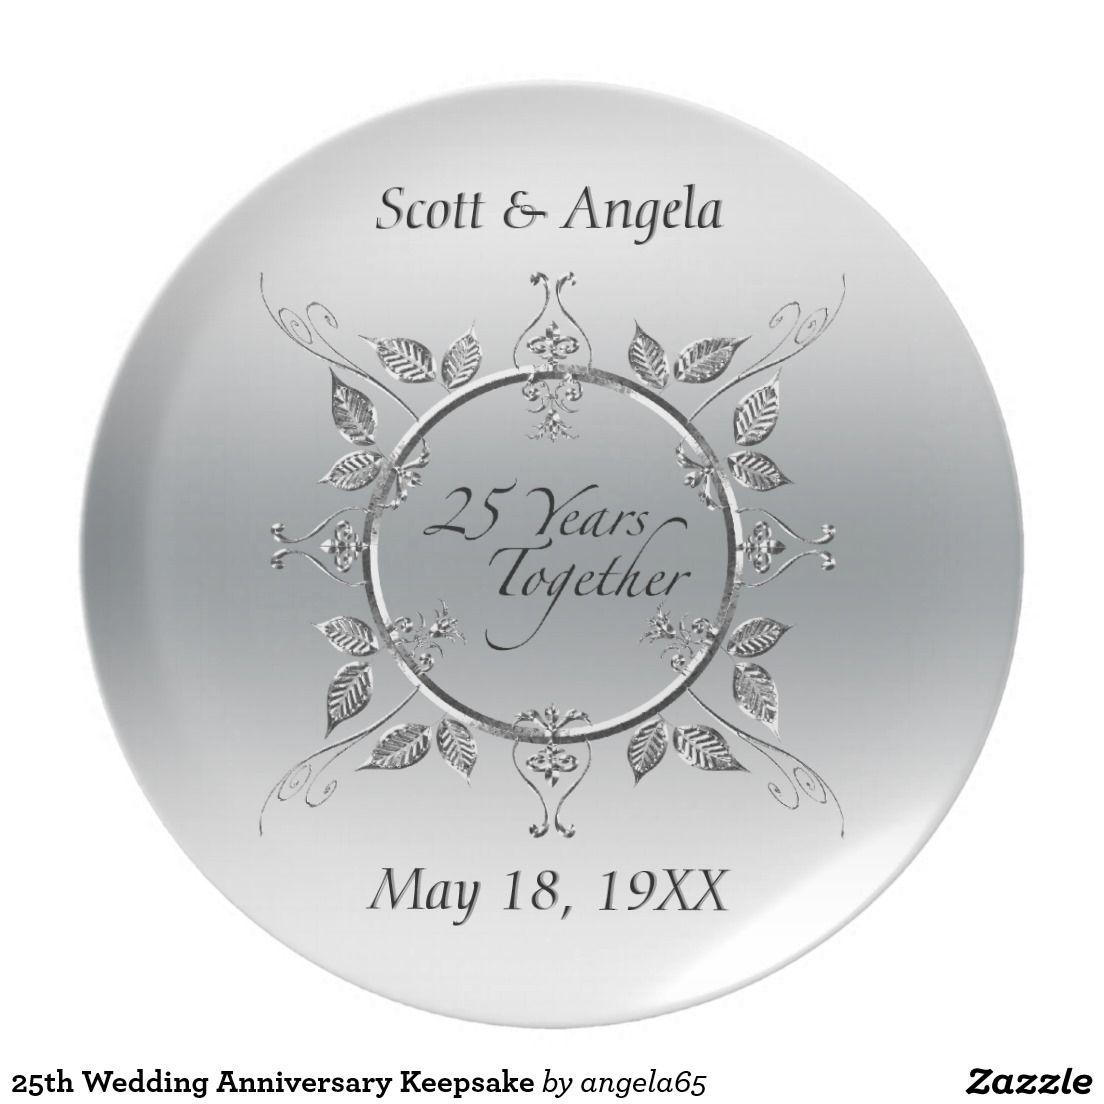 25th Wedding Anniversary Keepsake Melamine Plate 20% Off www.leatherwooddesign.com